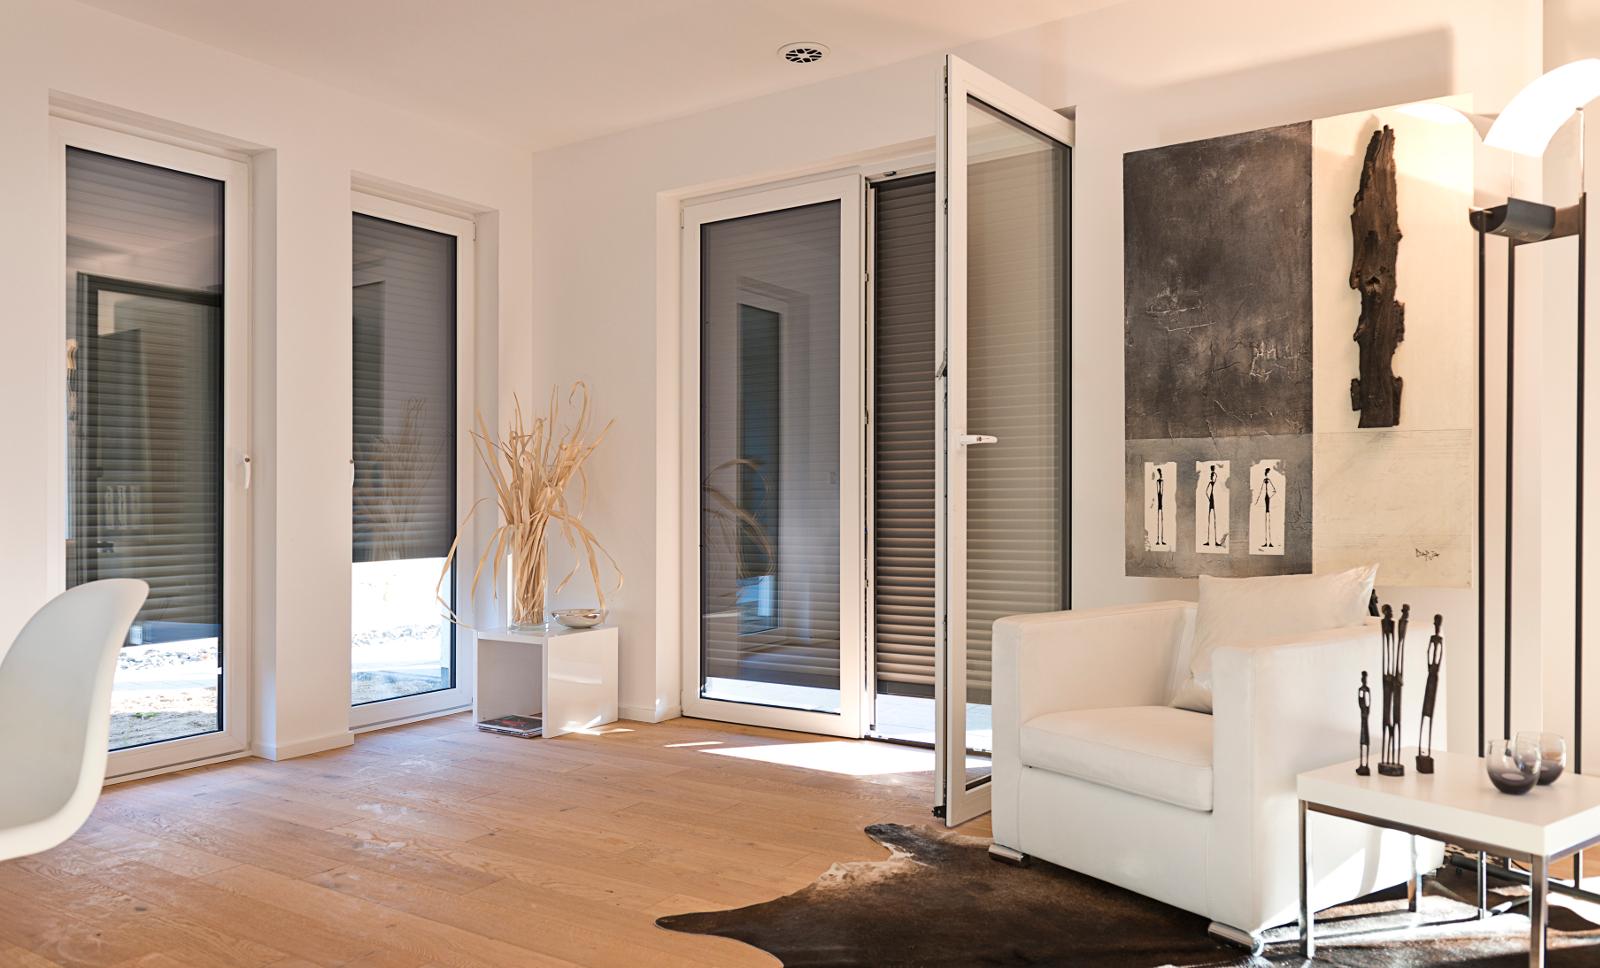 sonnenschutz au en viel mehr als nur beschattung heroal. Black Bedroom Furniture Sets. Home Design Ideas